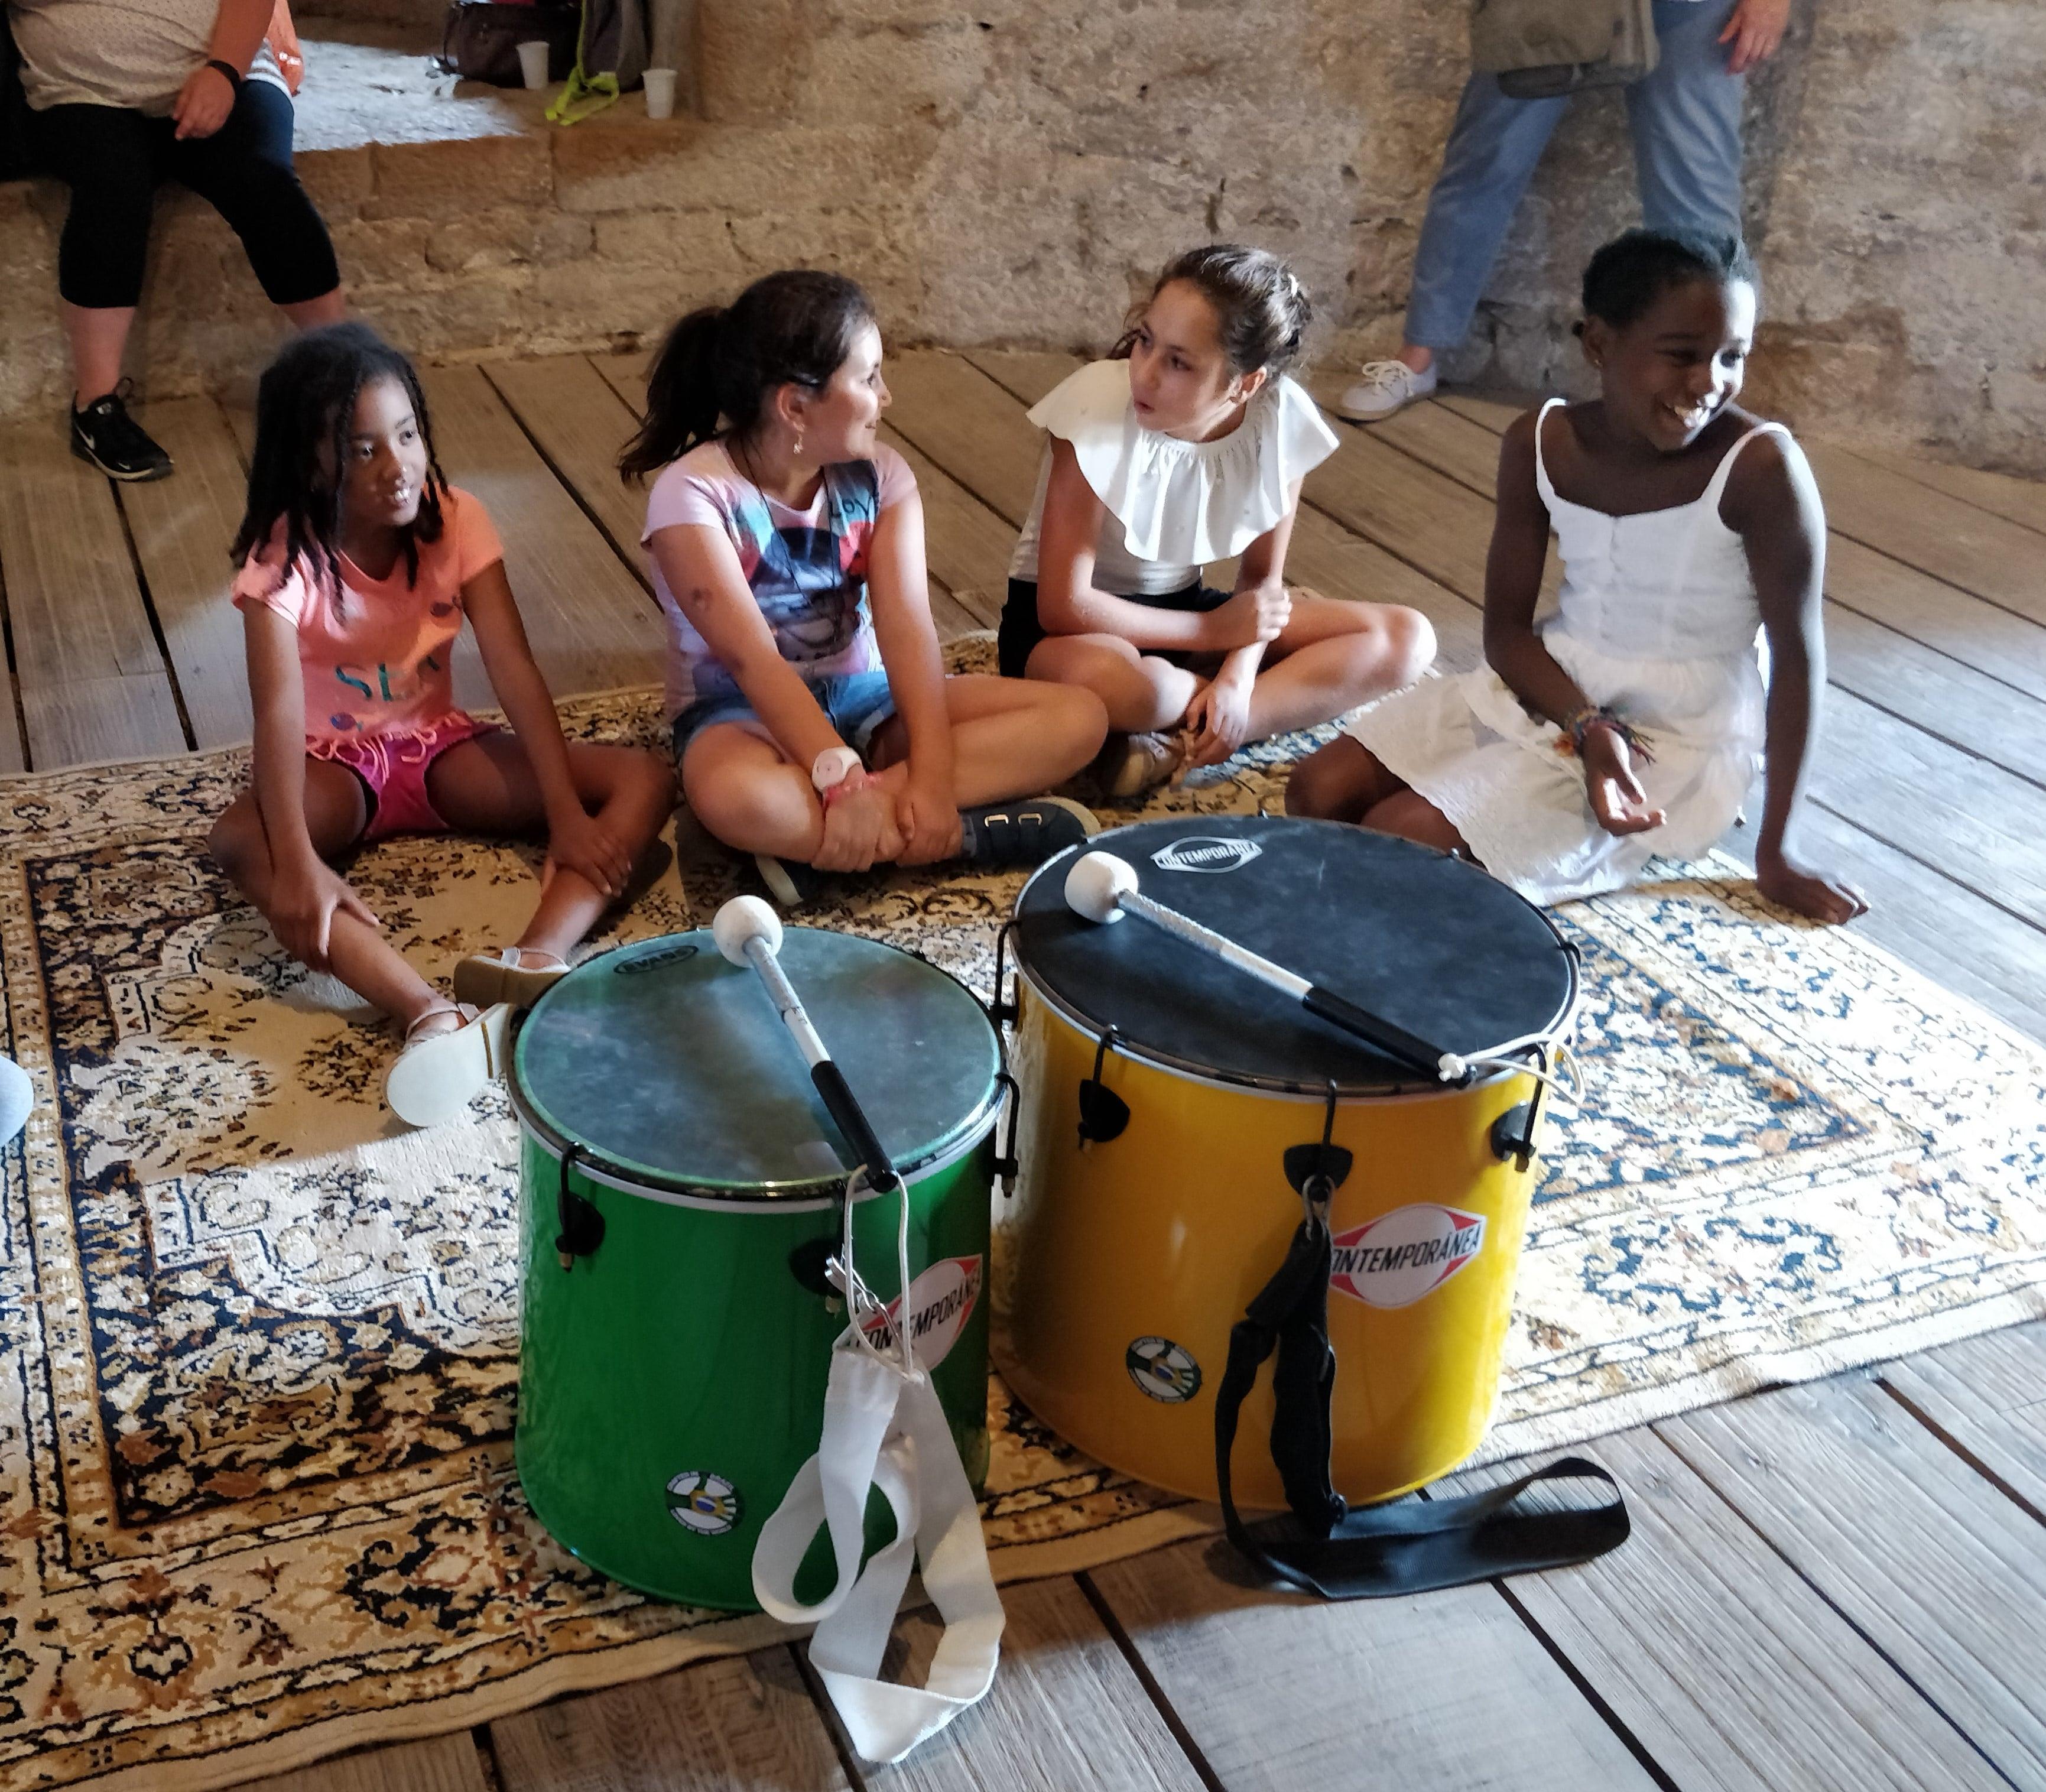 initiation percussions filles souriantes cluny juillet 2018 horizon parrainage